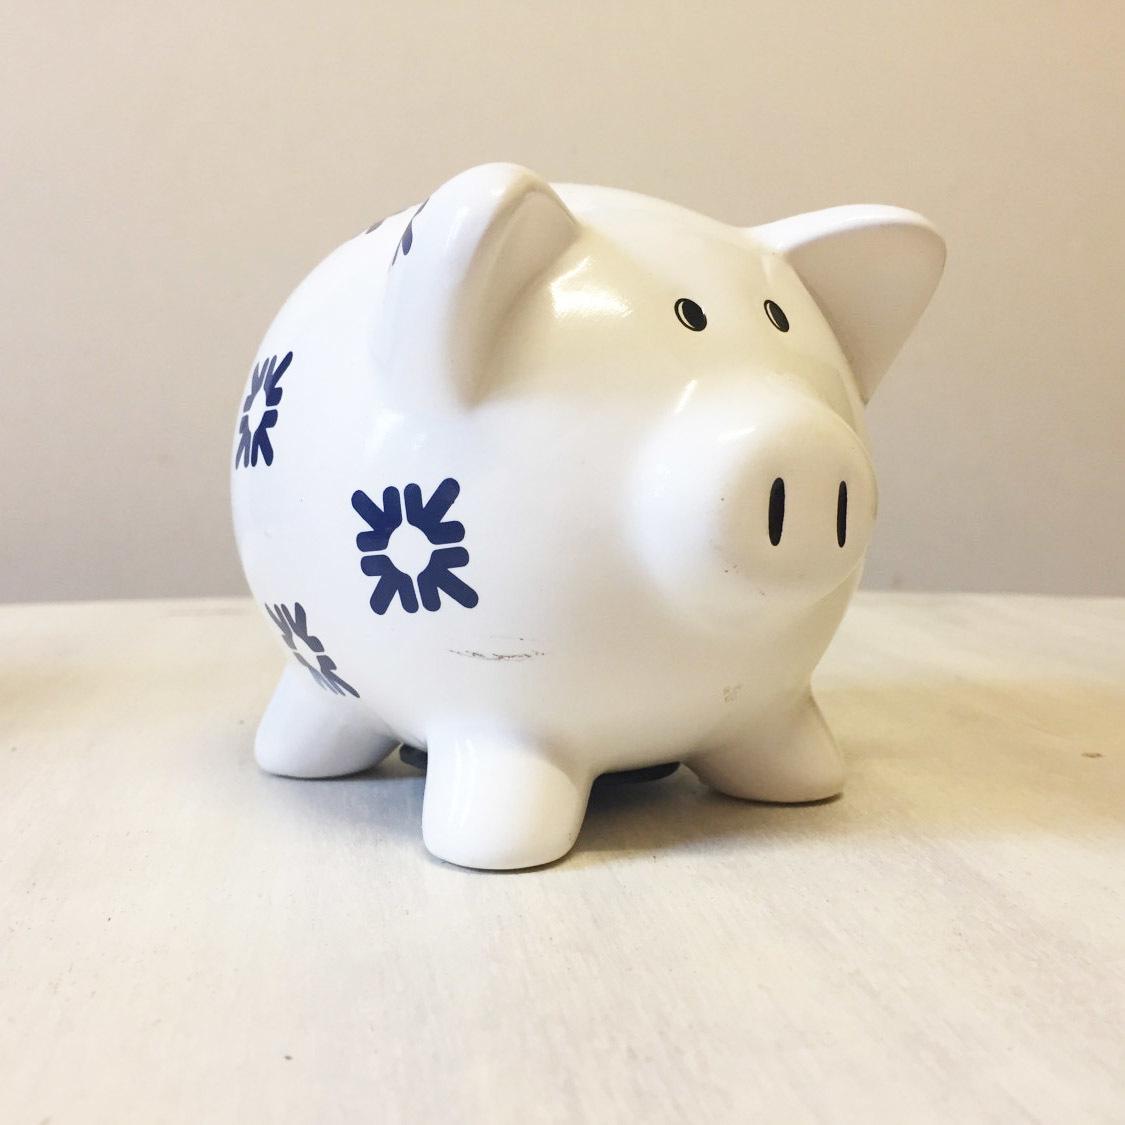 Vintage RBS piggy bank